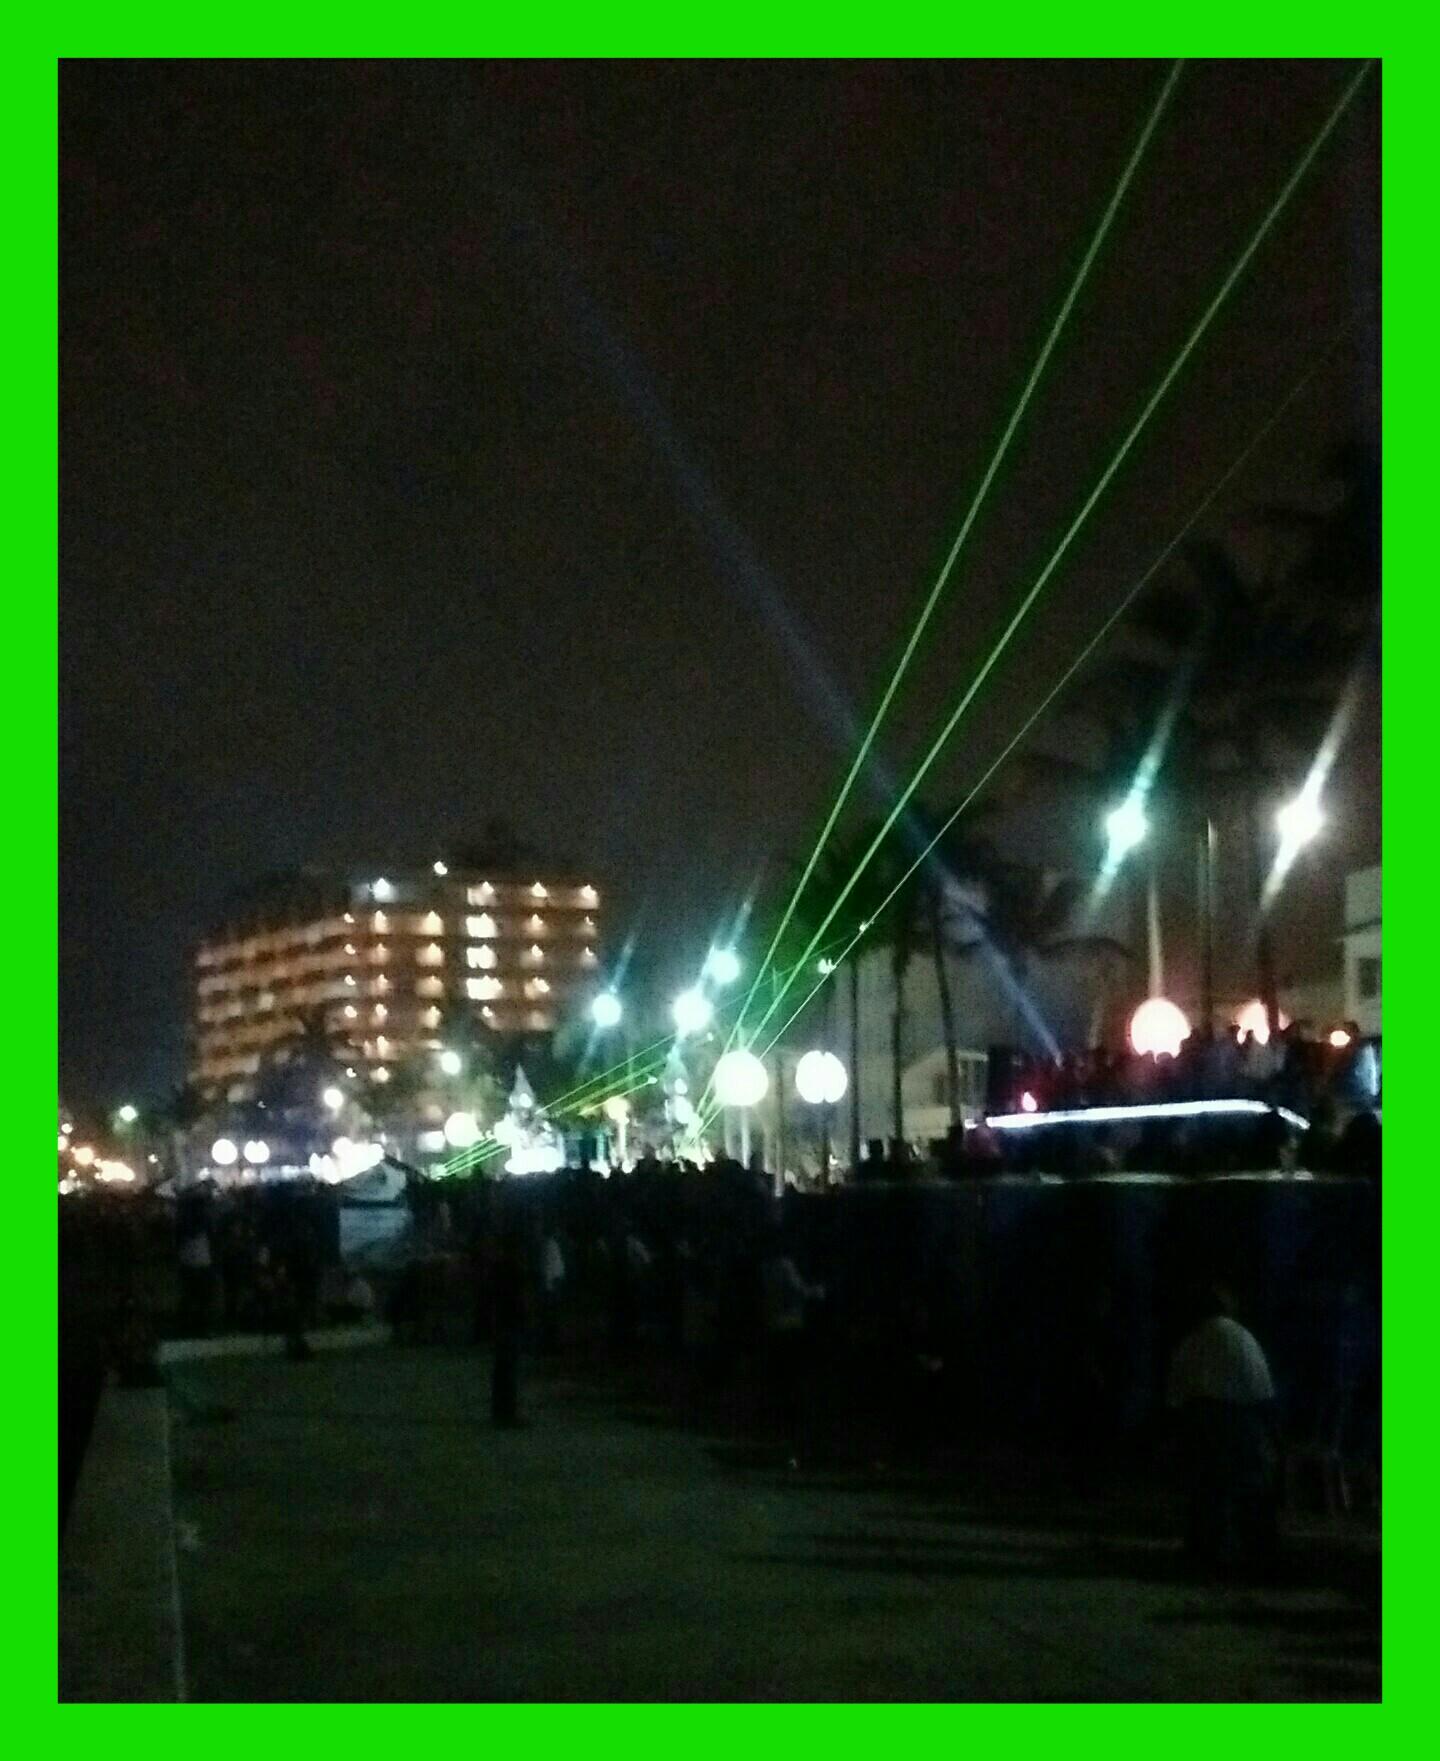 Veracruz_lasers